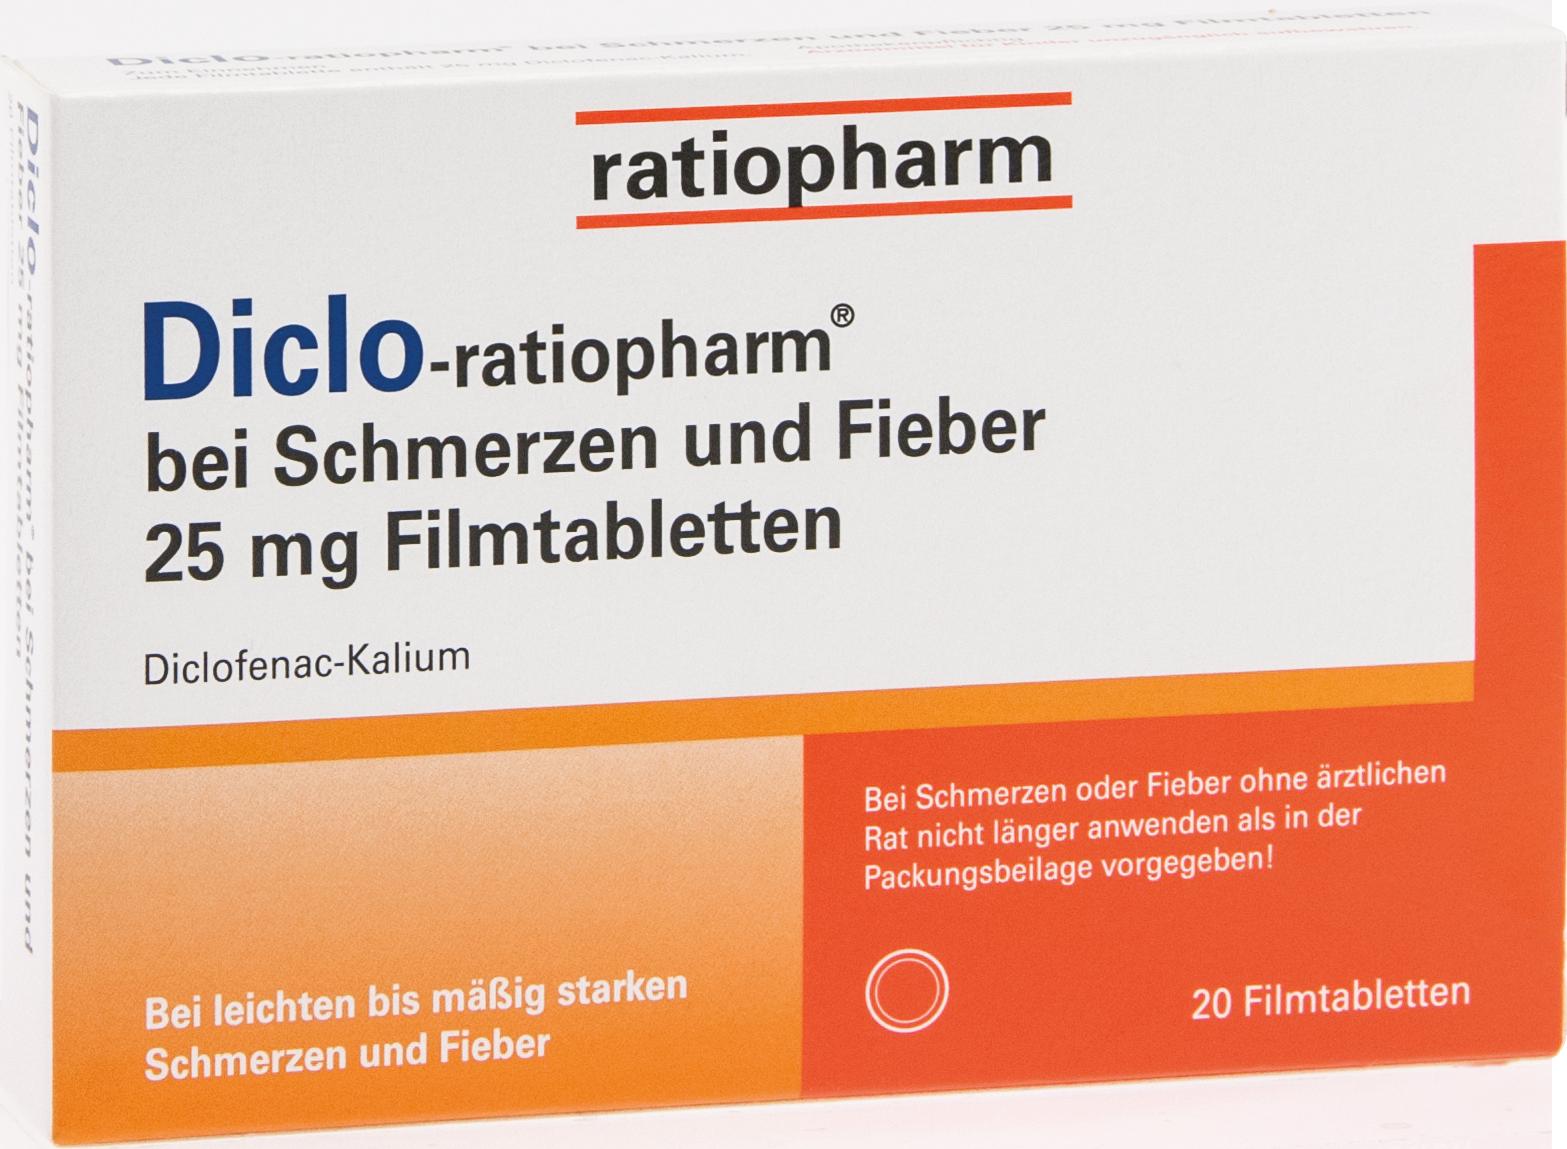 Diclo-ratiopharm bei Schmerzen und Fieber 25 mg